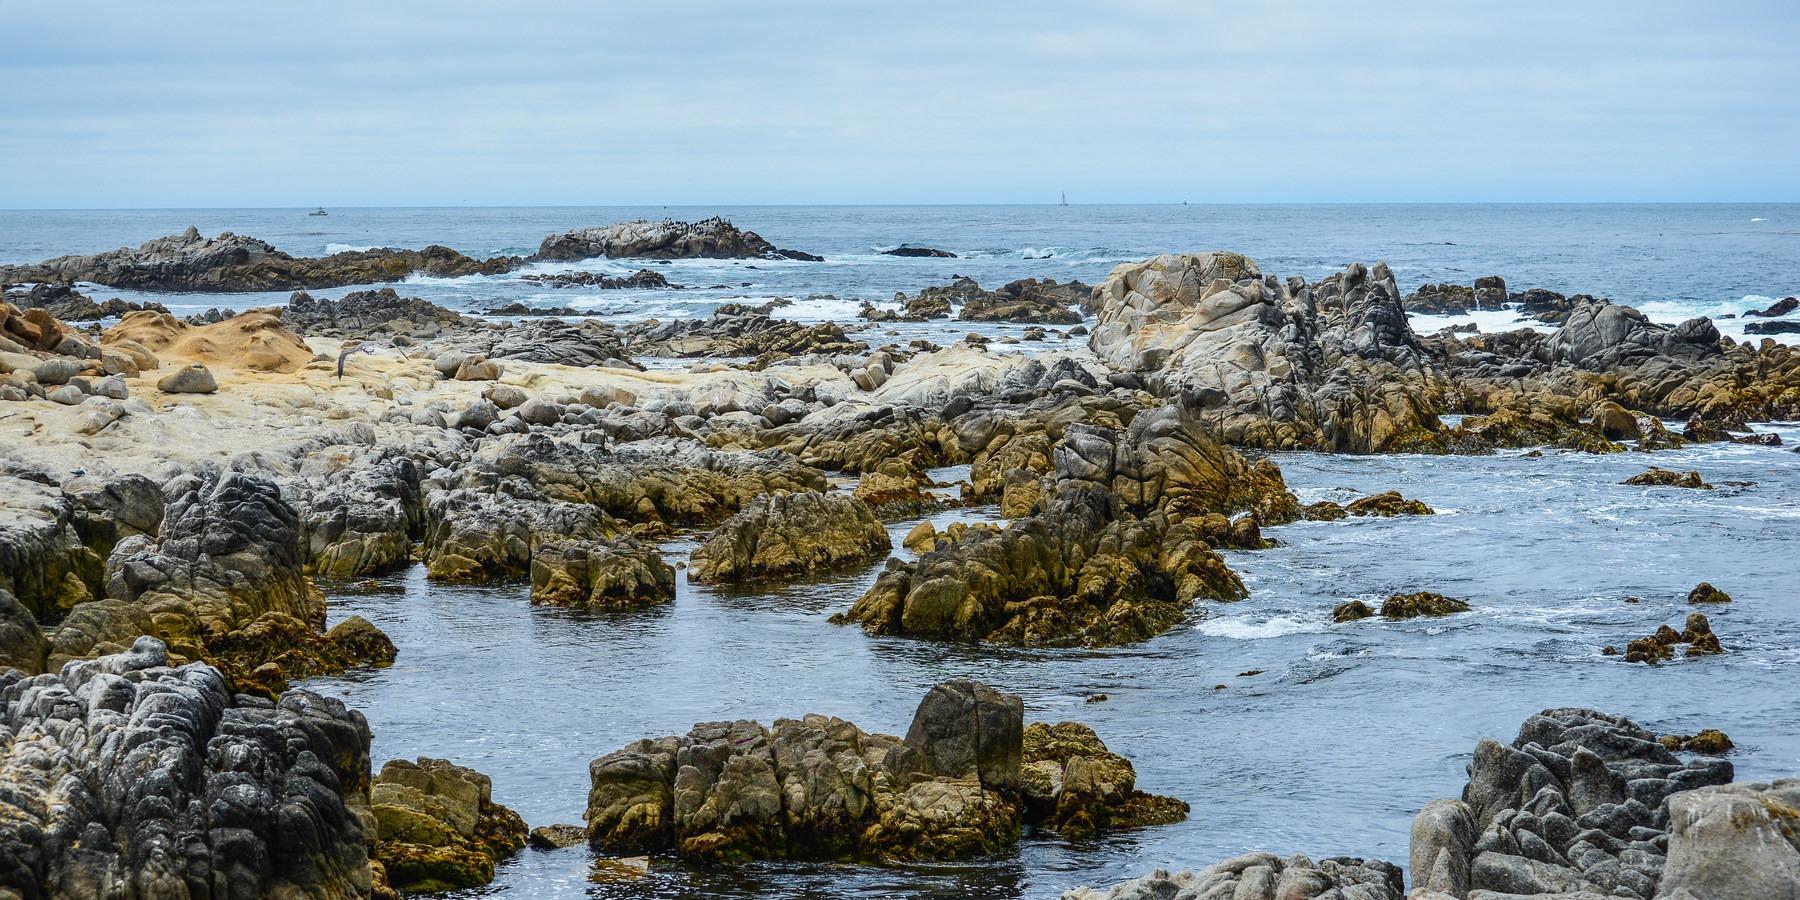 The Rocky Sline Creates An Abundance Of Tidepools At Asilomar State Marine Reserve